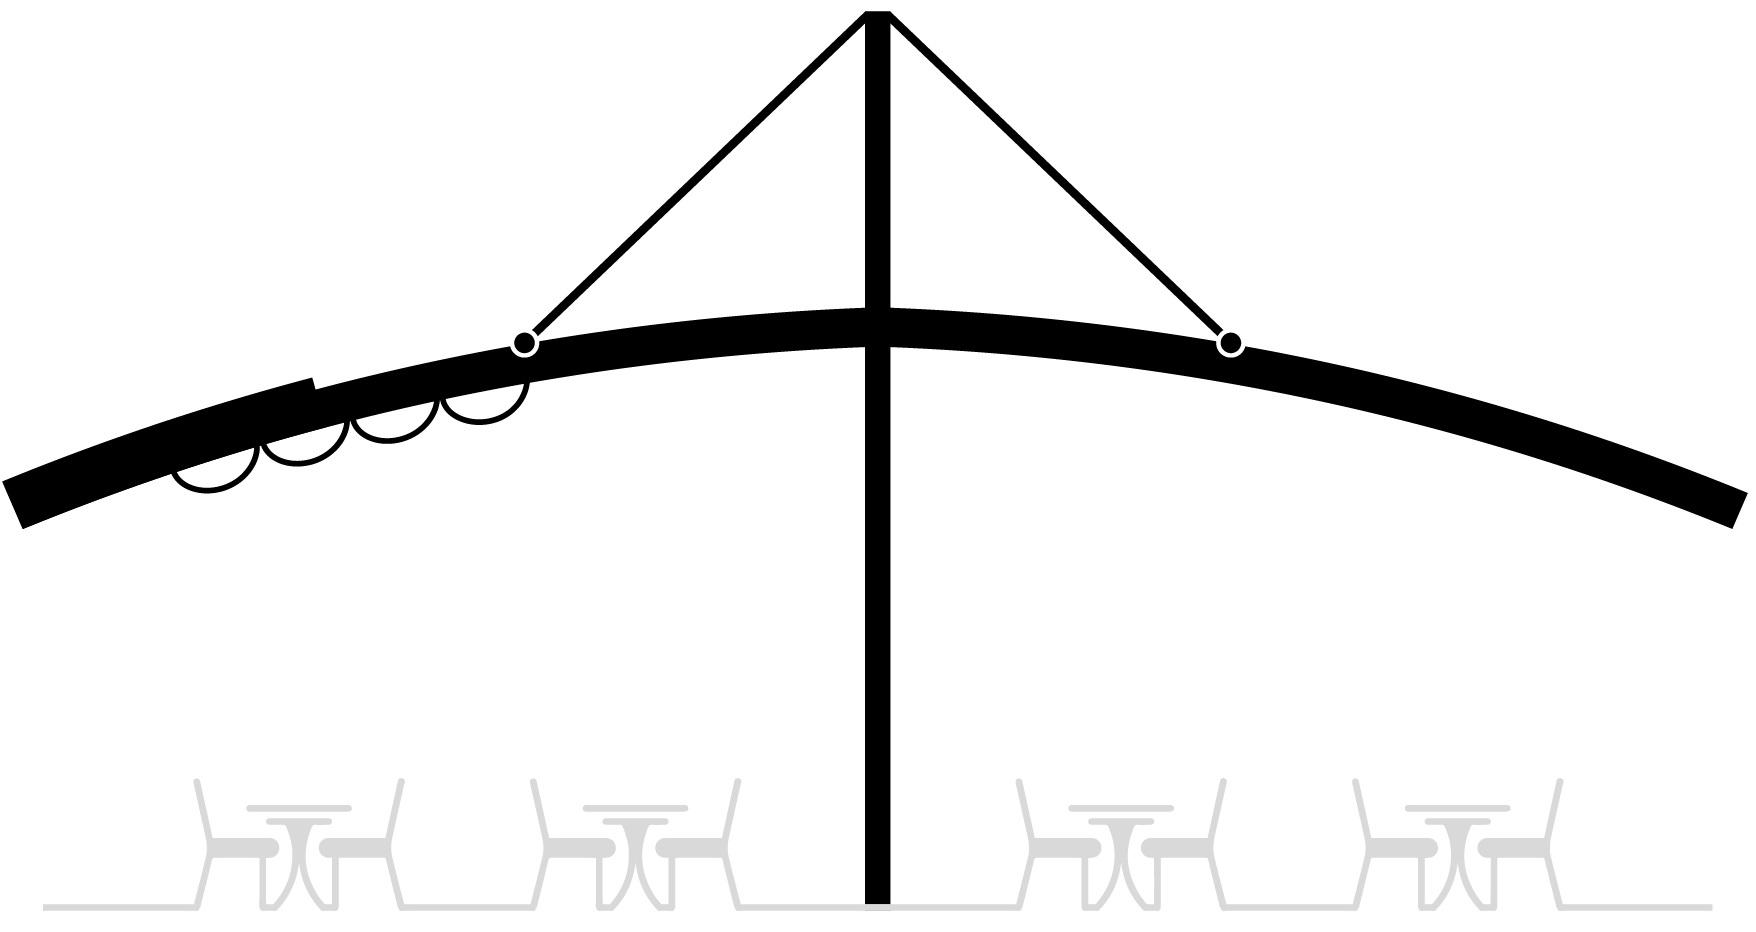 Pergola retractabila Vault Variance. Modele de pergole retractabile Sun Leader